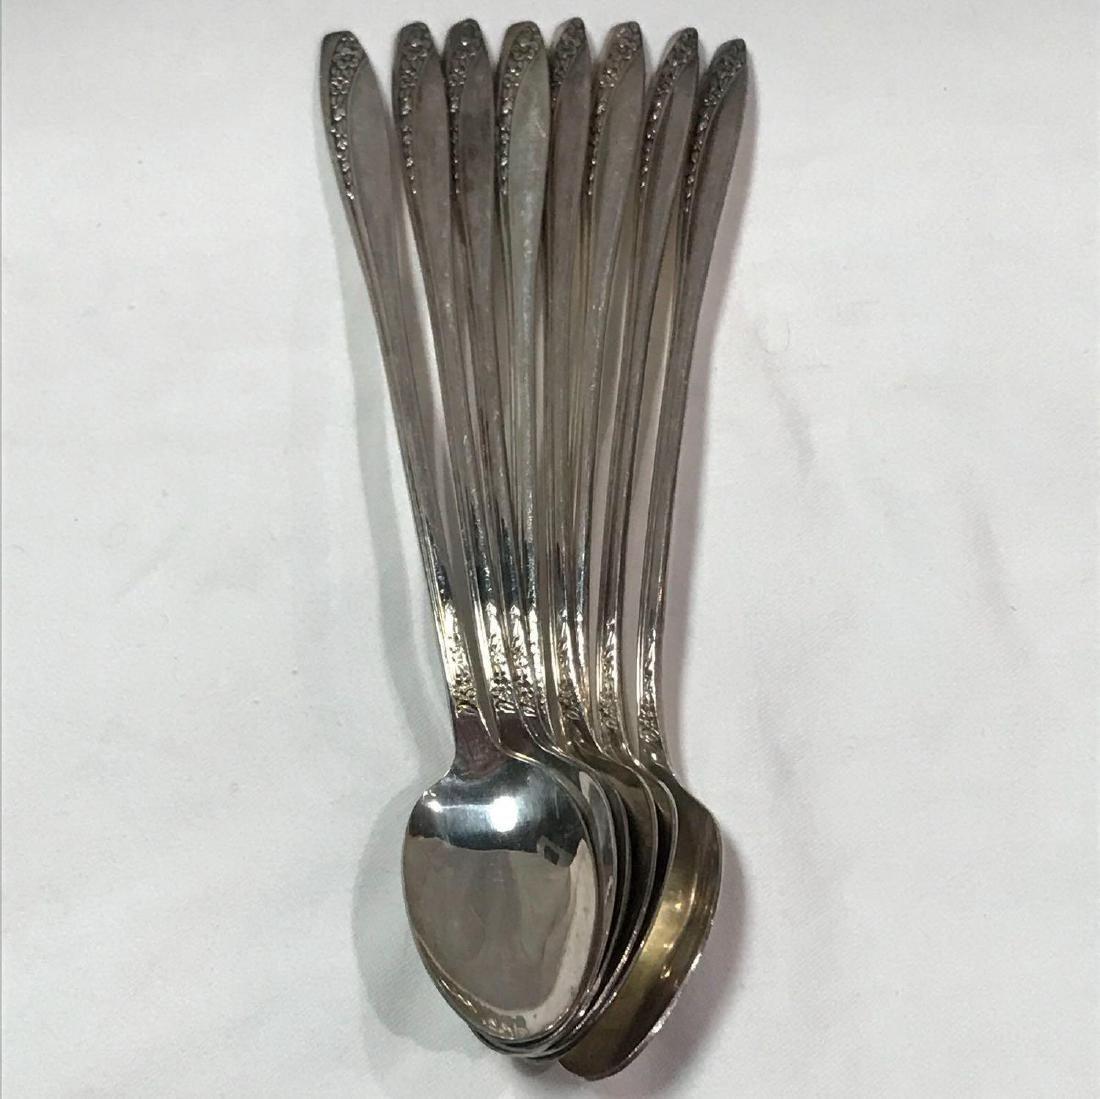 8 Wm Rogers International Silver Iced Tea Spoons